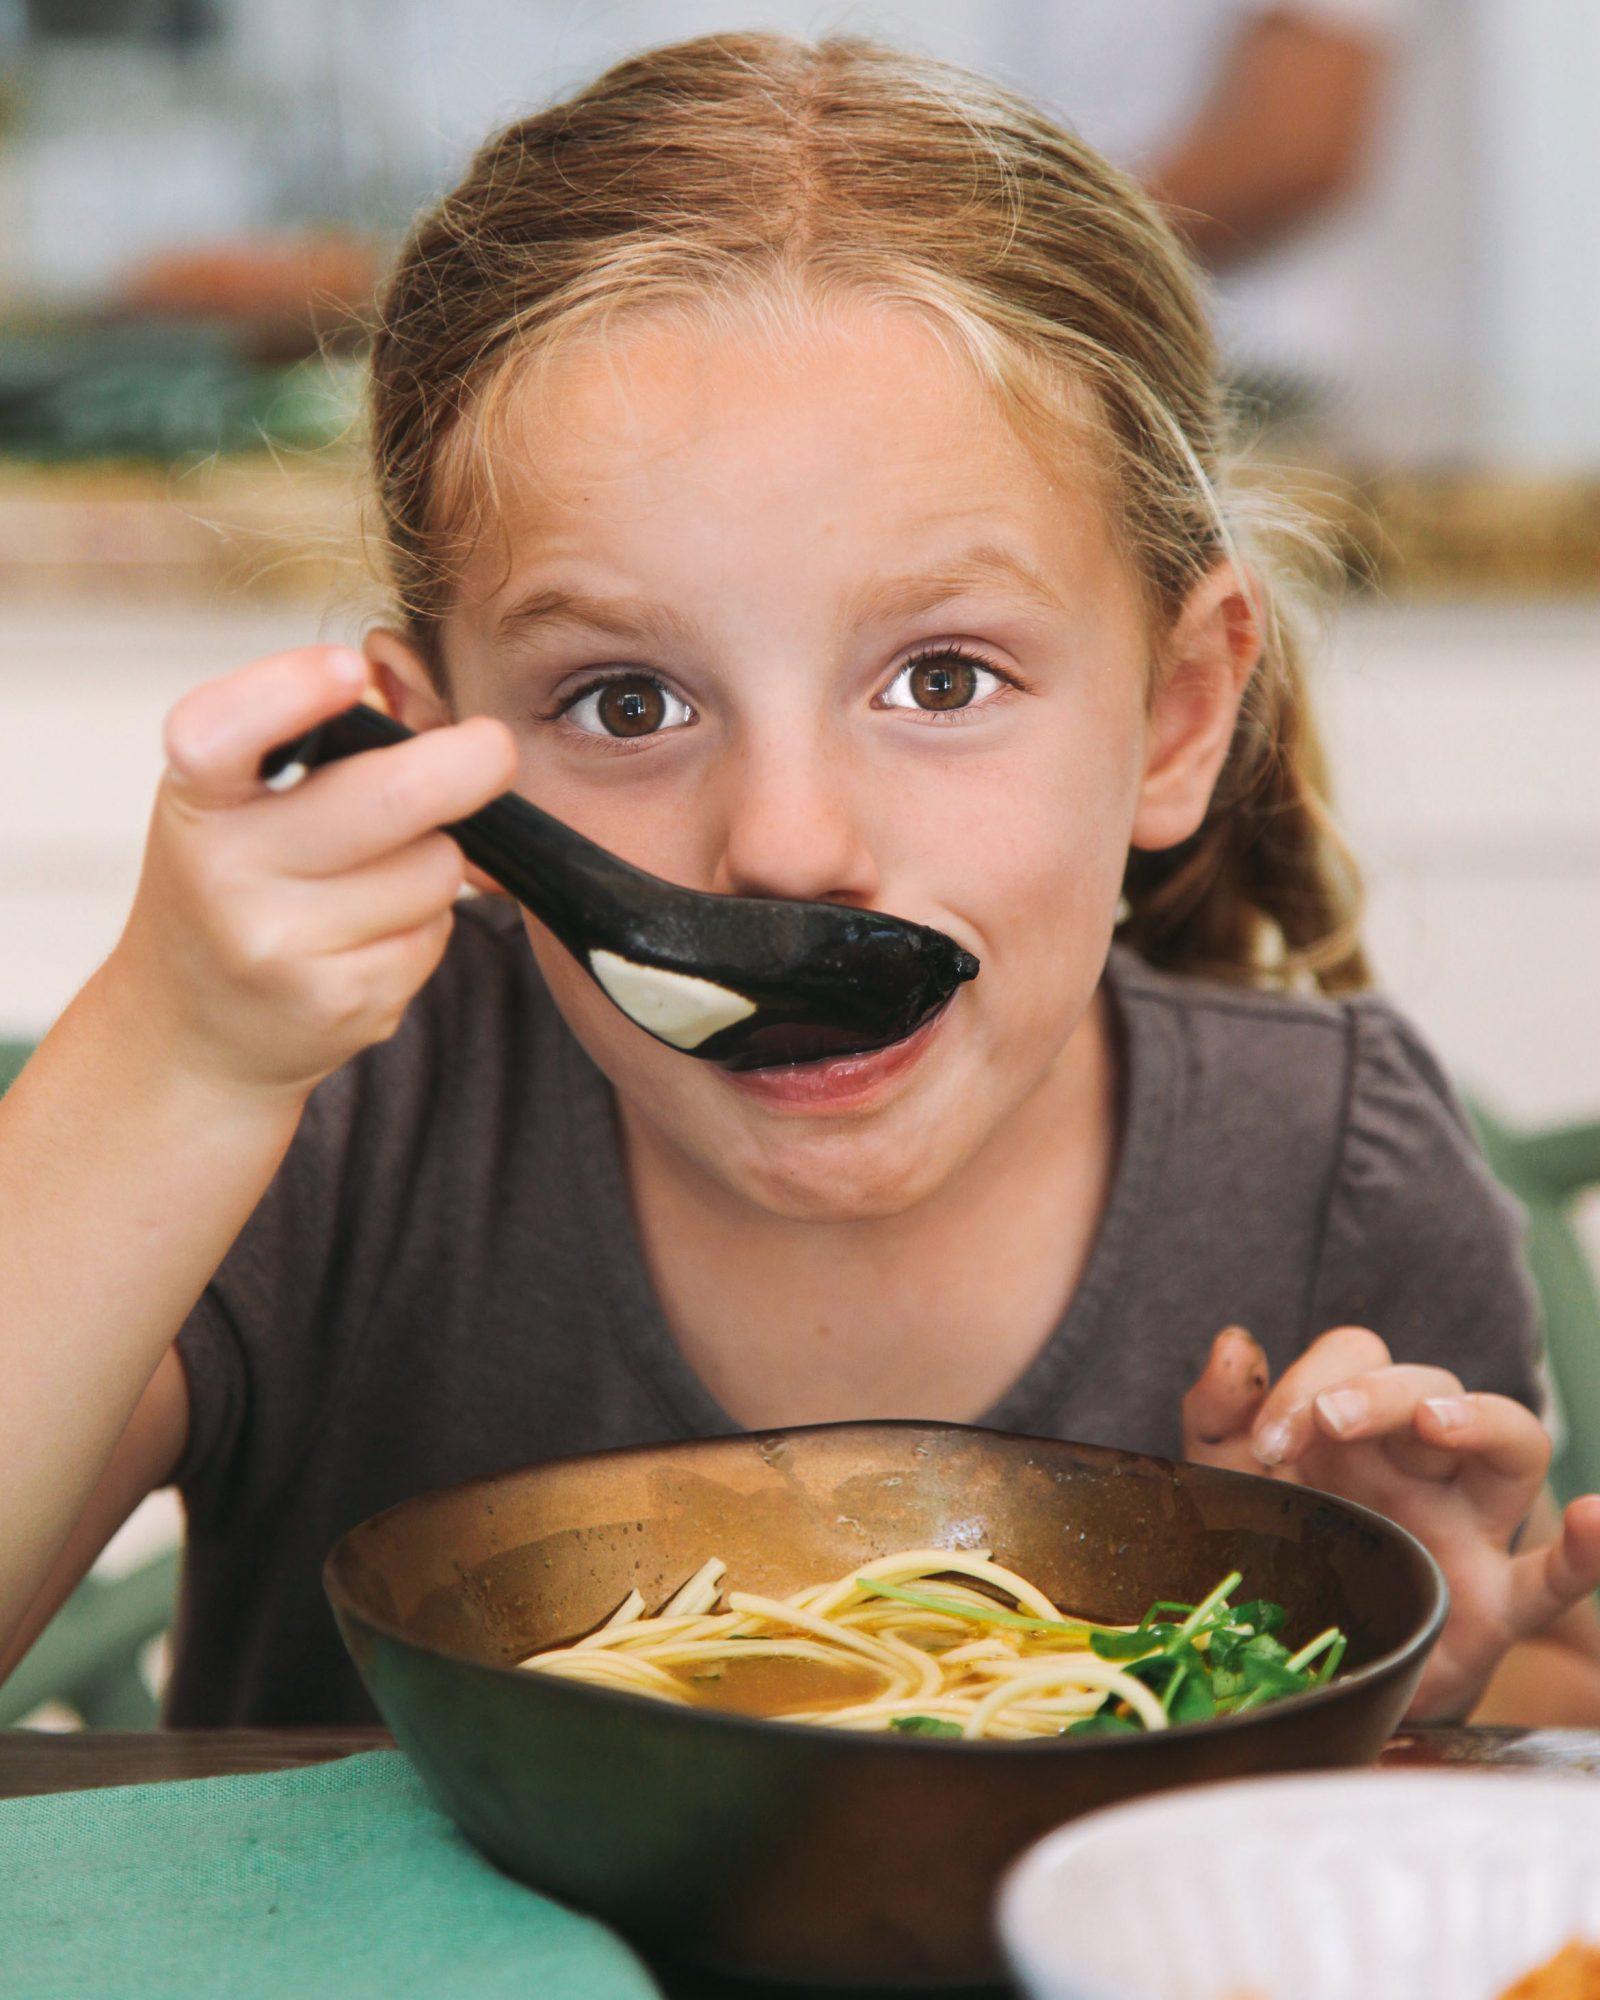 blais daughter eating ramen